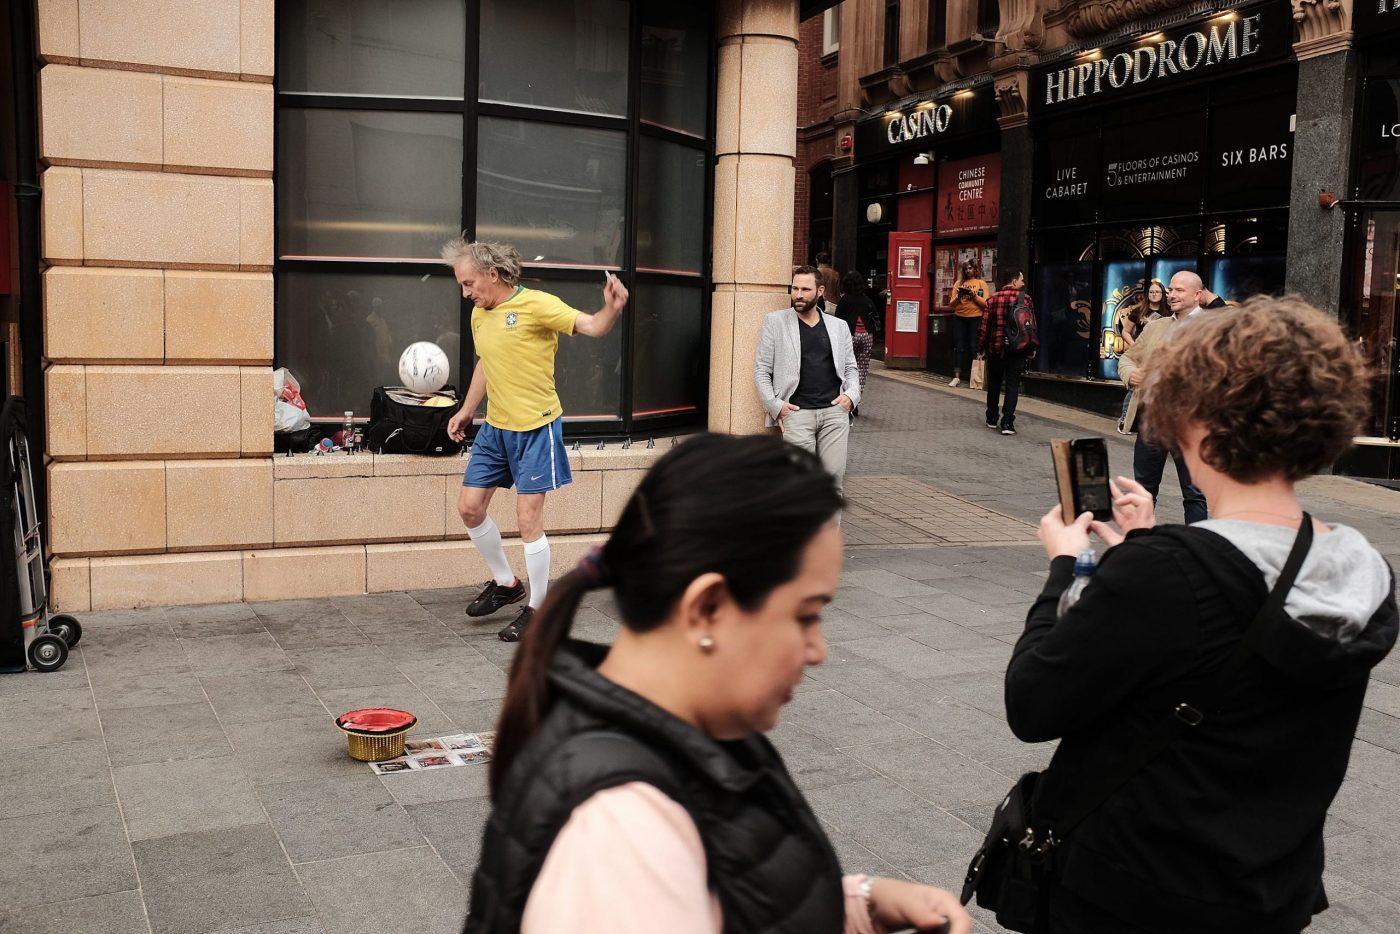 street footballer London showcasing kick ups